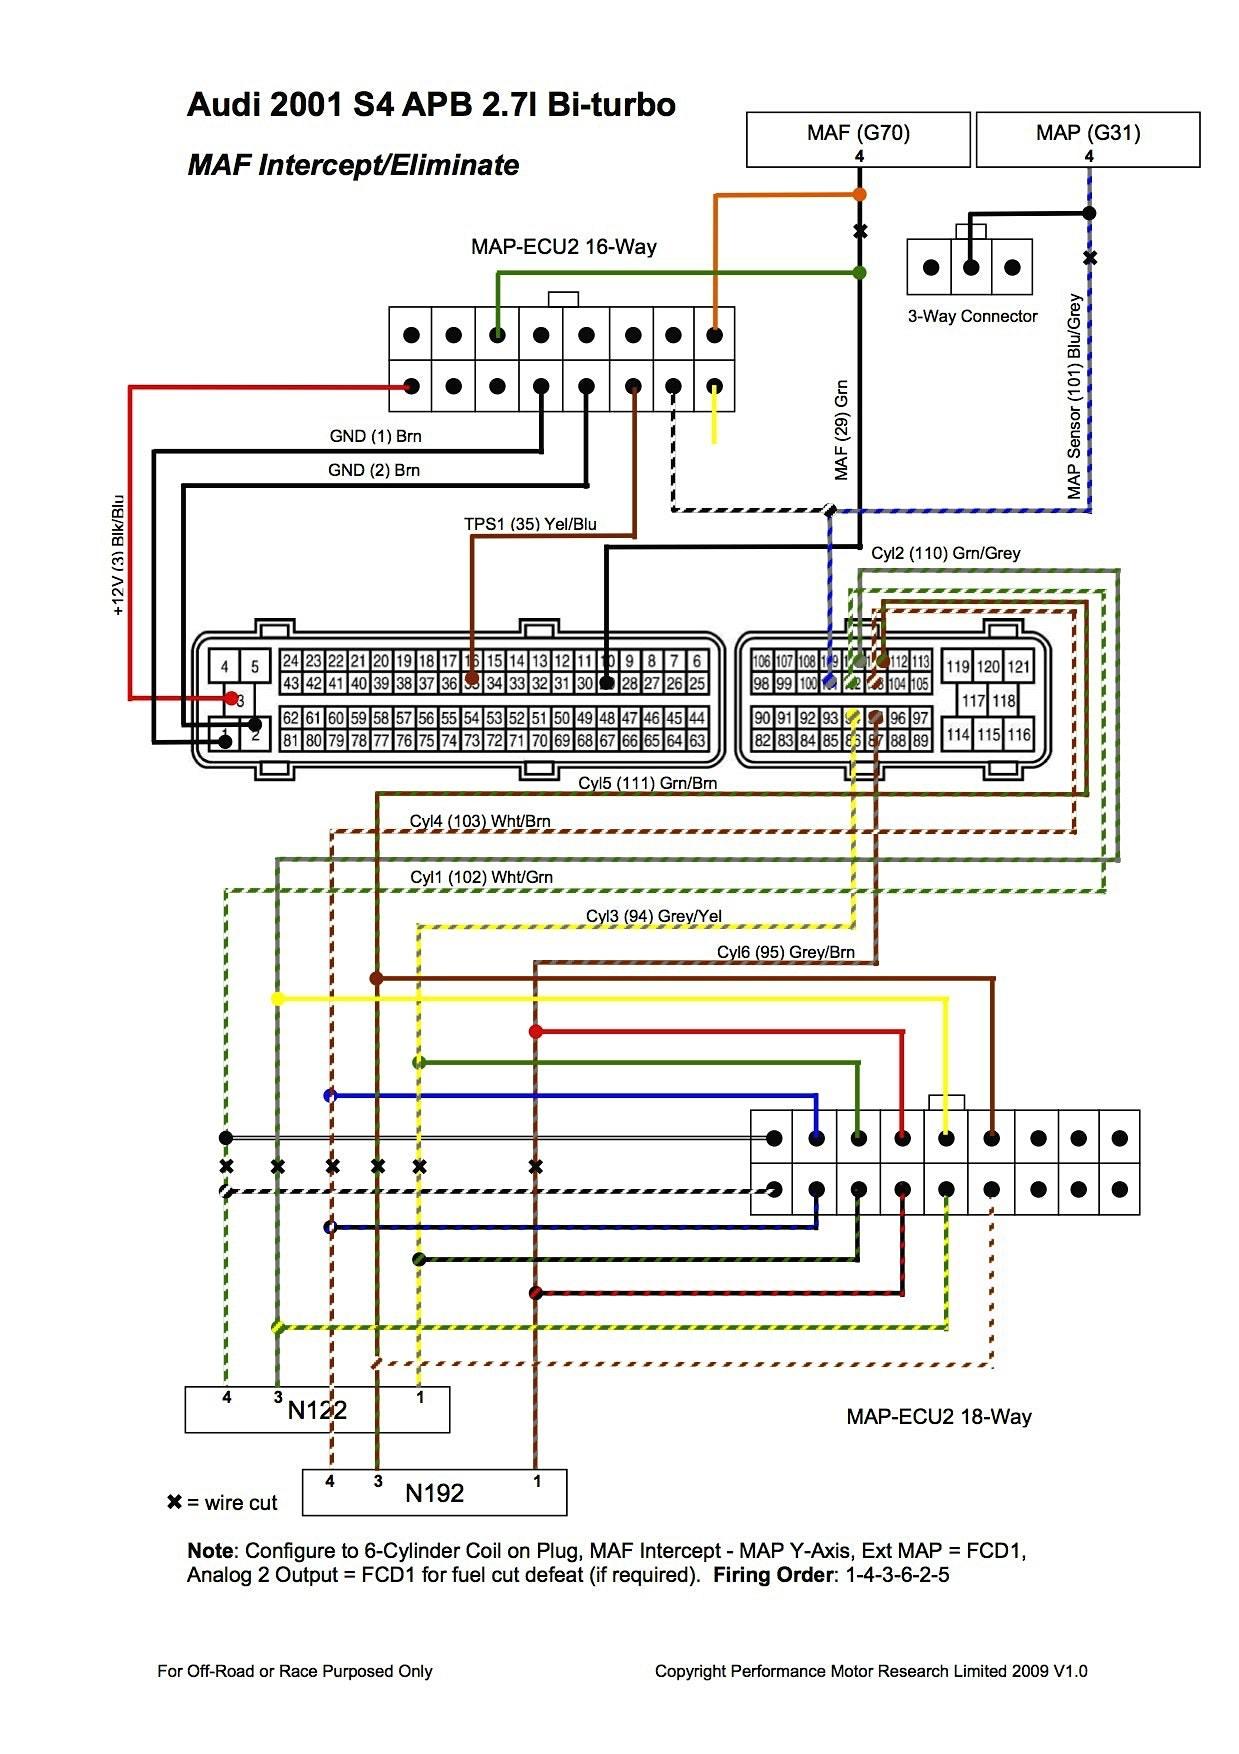 1996 vw golf wiring diagram wiring diagram schematic 1996 audi a4 stereo wiring